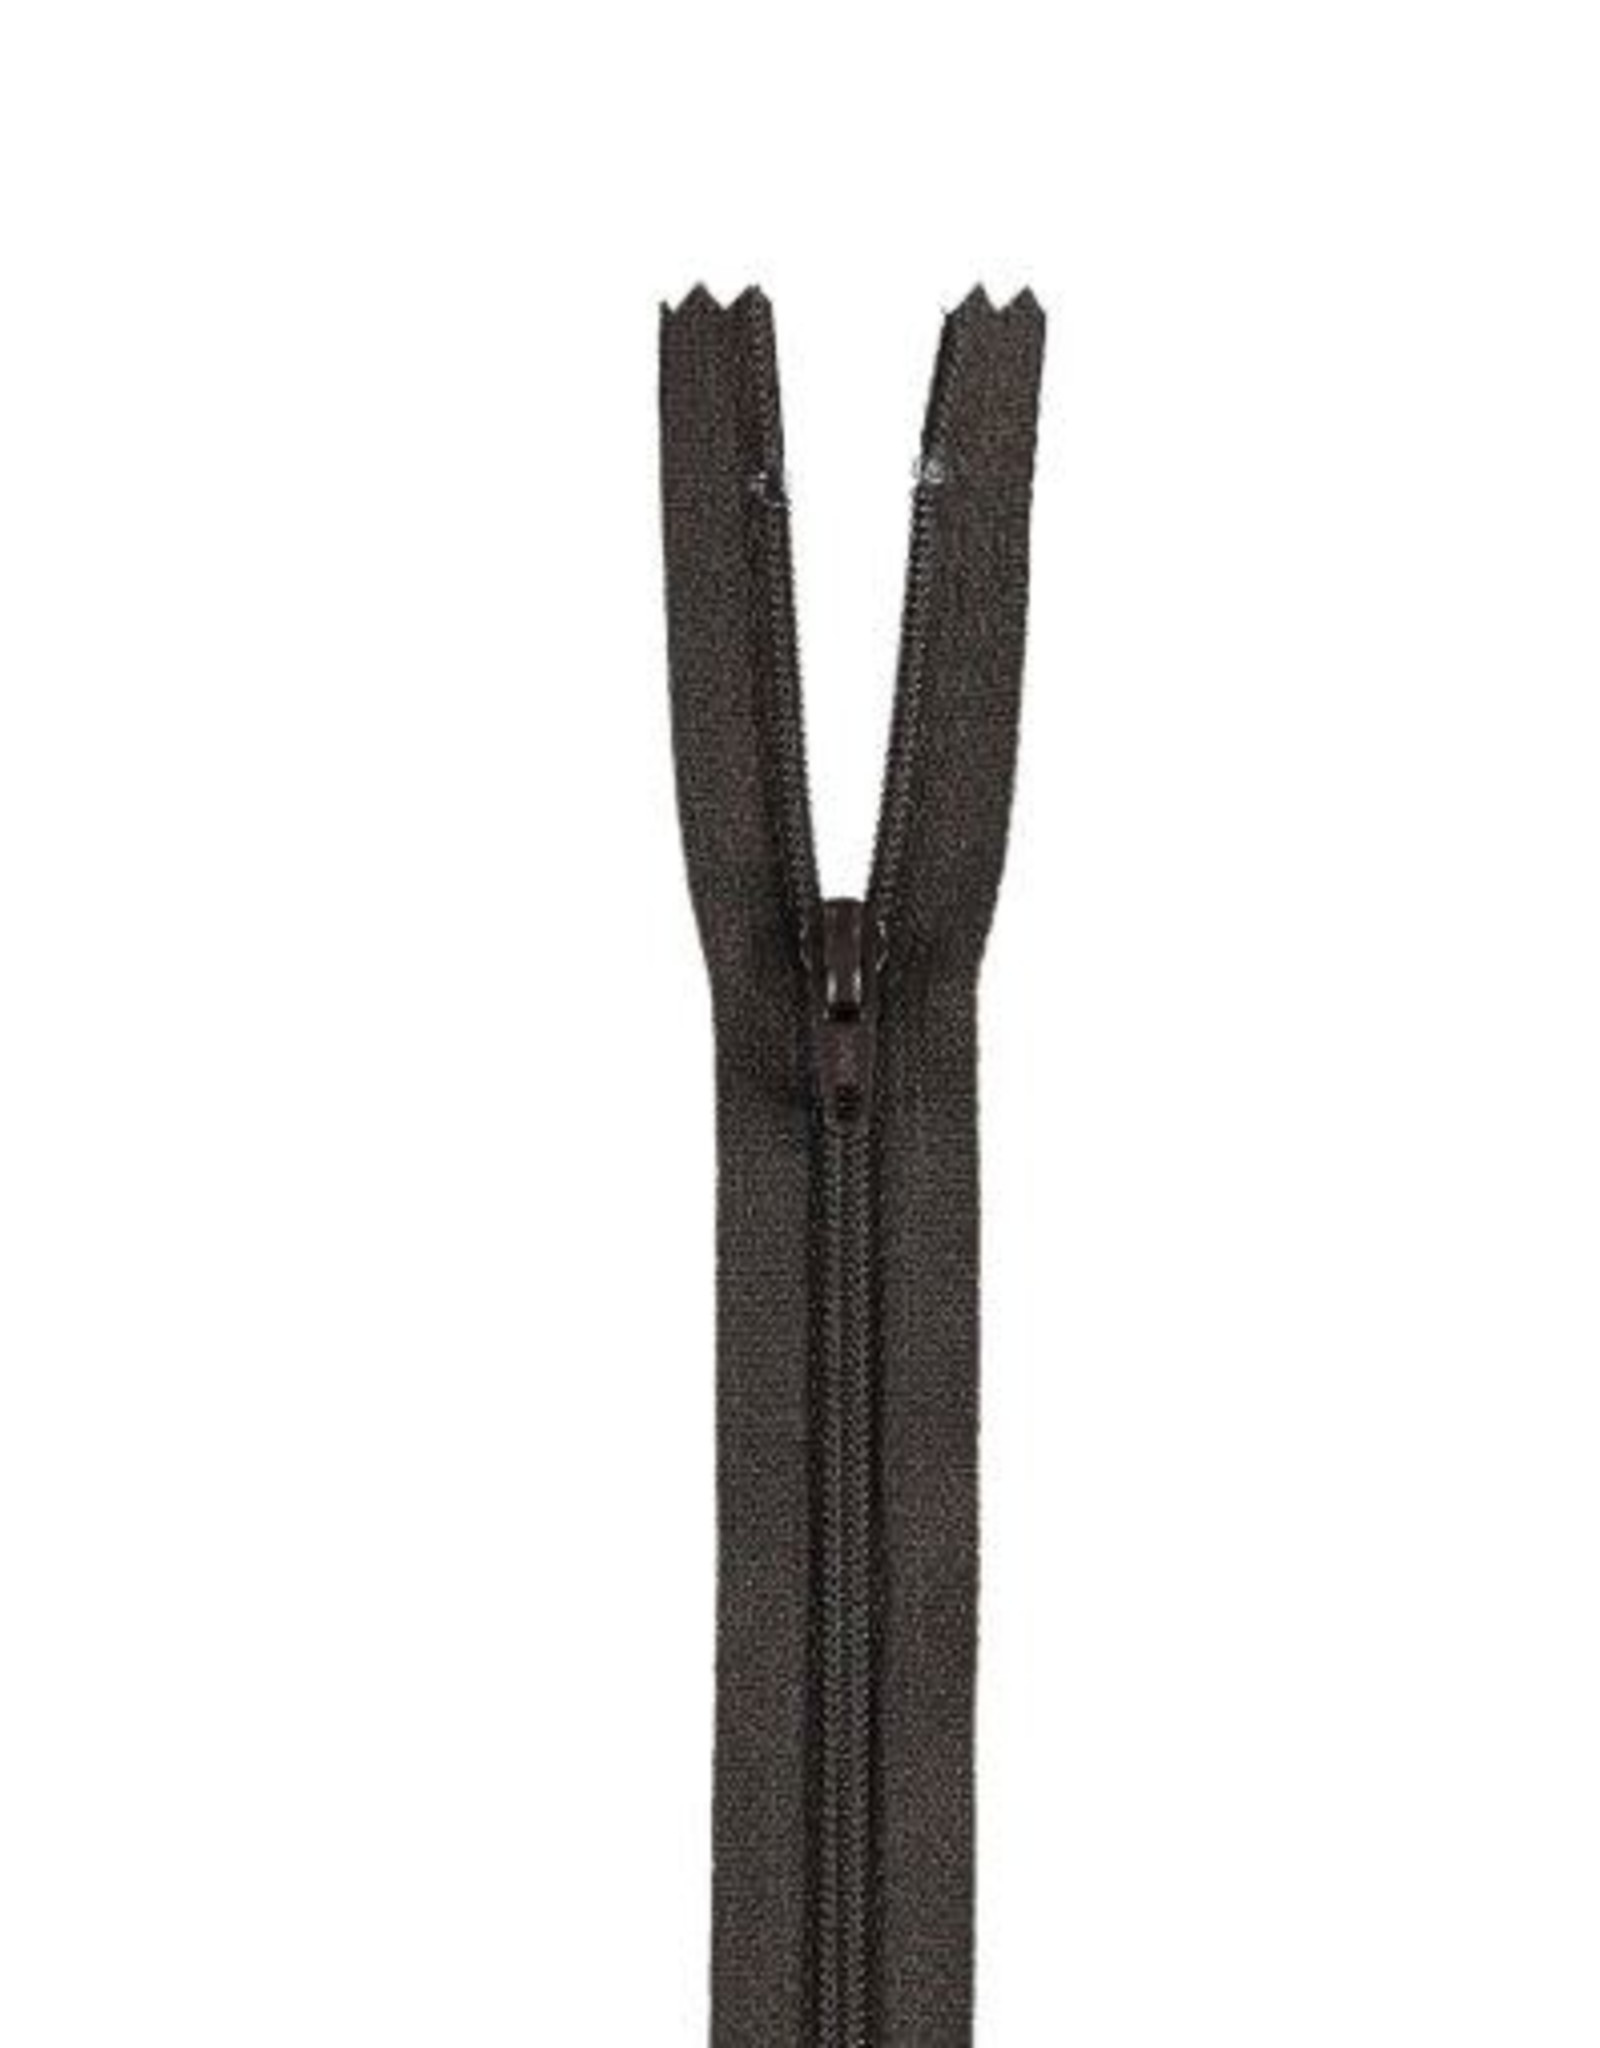 YKK Spiraalrits niet-DB 3mm zwart bruin 916-40cm